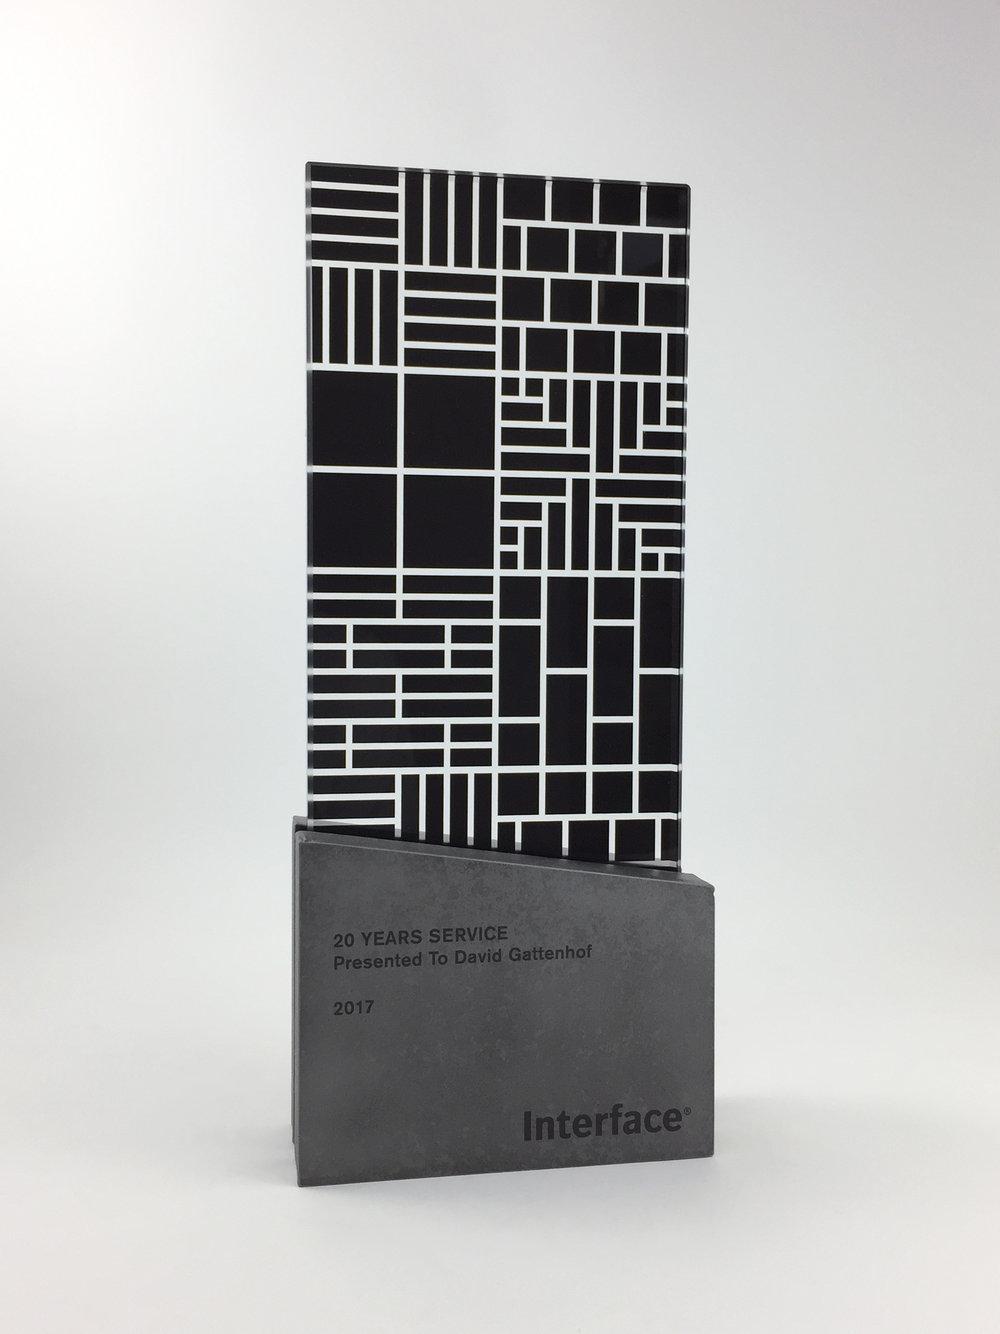 interface-awards-metal-glass-graphic-art-trophy-06.jpg